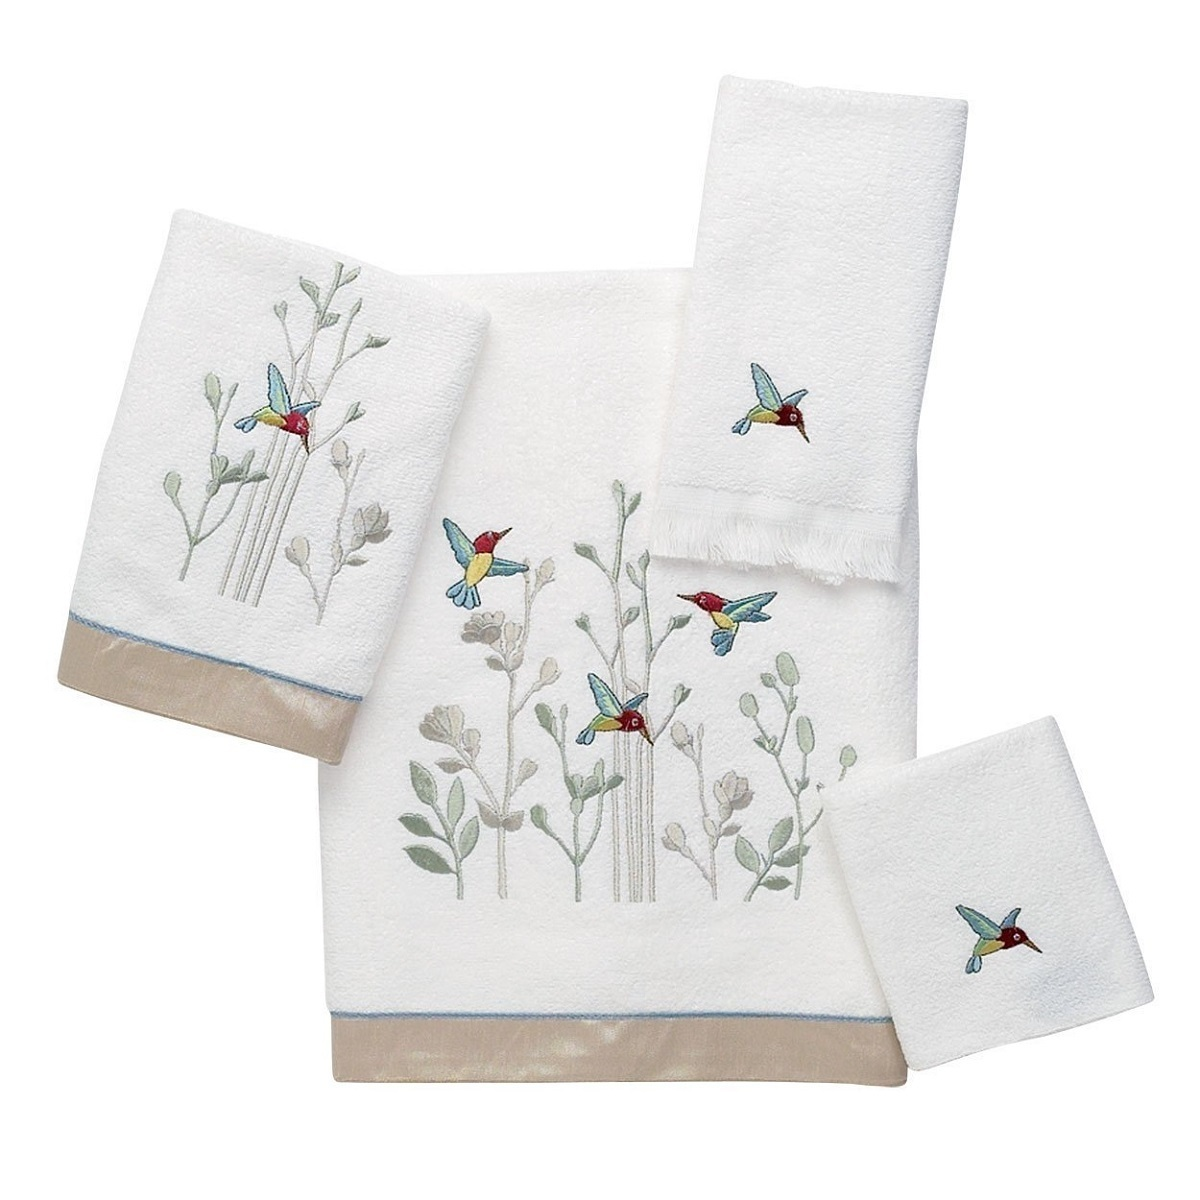 Полотенца Полотенце 69х132 Avanti Hummingbird белое elitnoe-polotentse-mahrovoe-hummingbird-ot-avanti-kanada.jpg